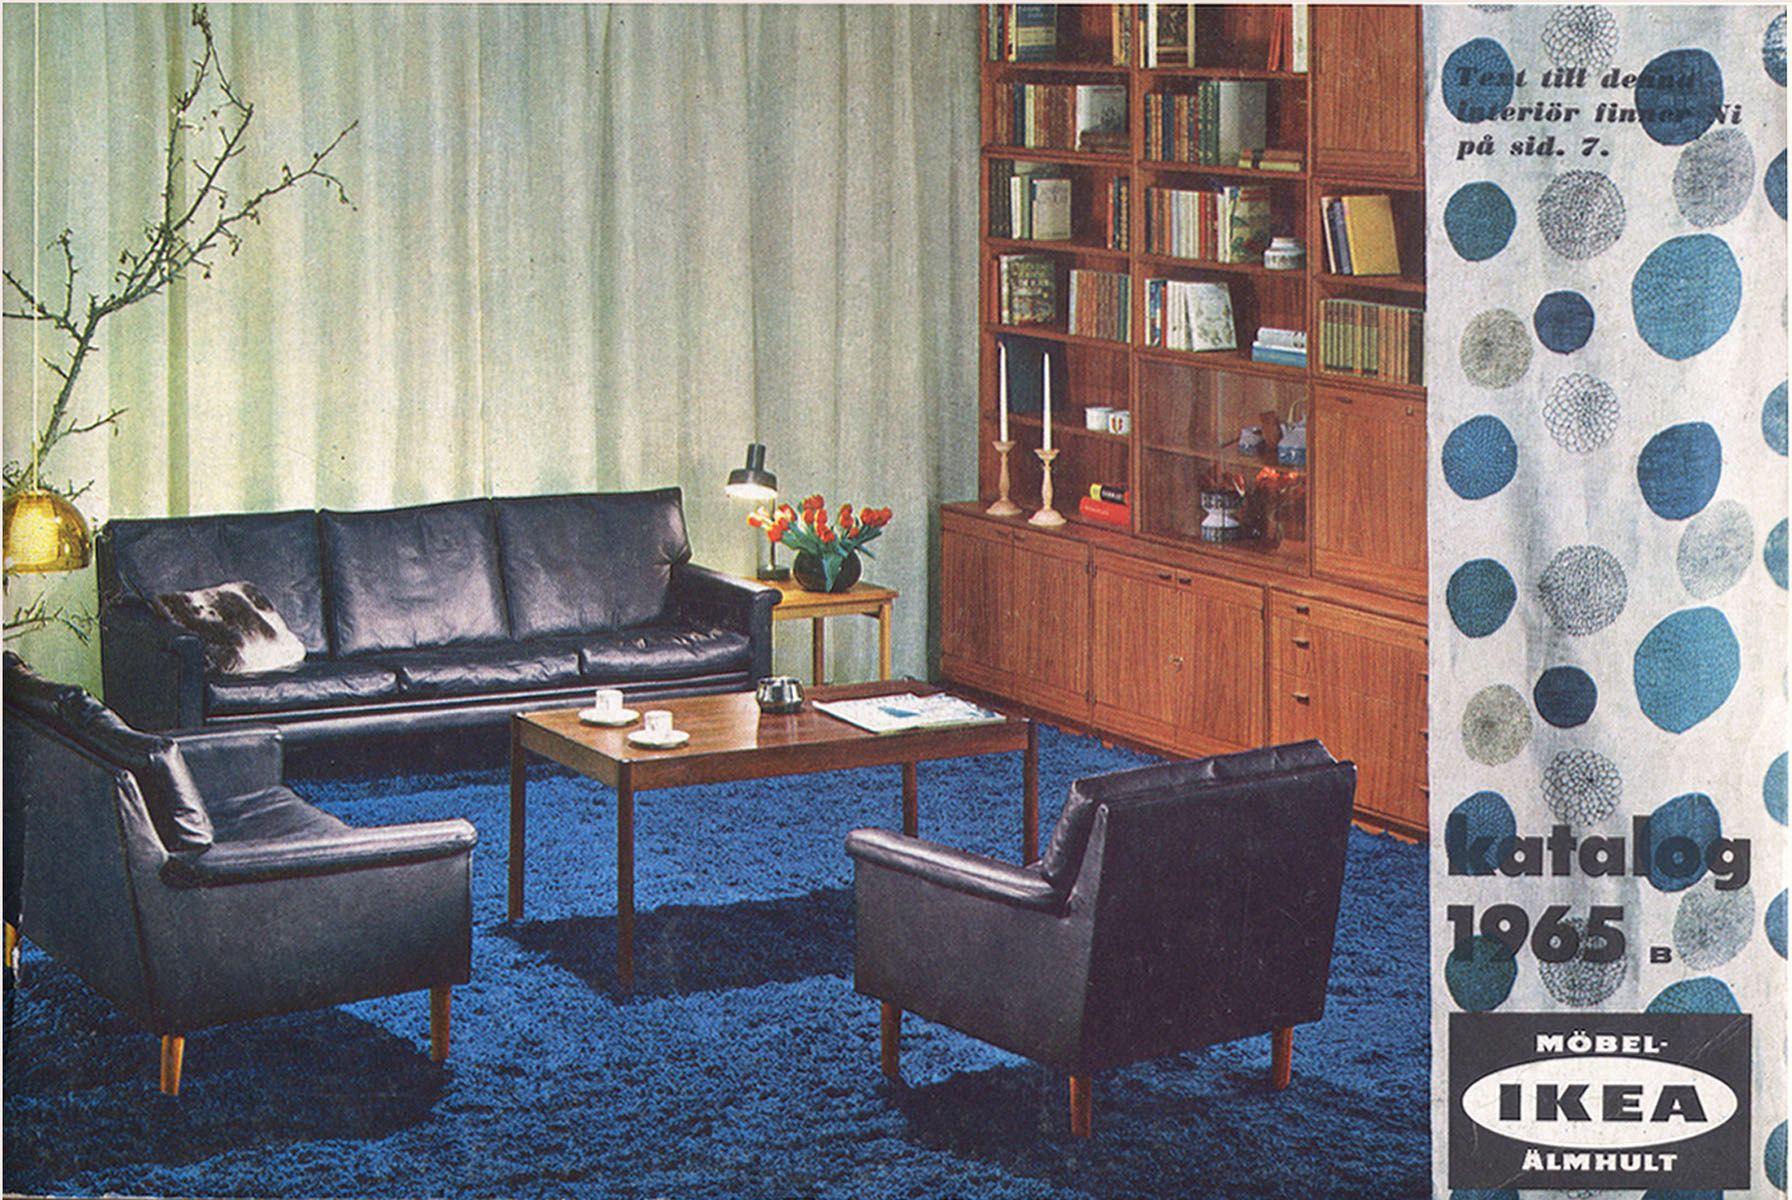 Ikea 1965 Unique Furniture Design Furniture Design Ikea Catalog [ 1200 x 1792 Pixel ]